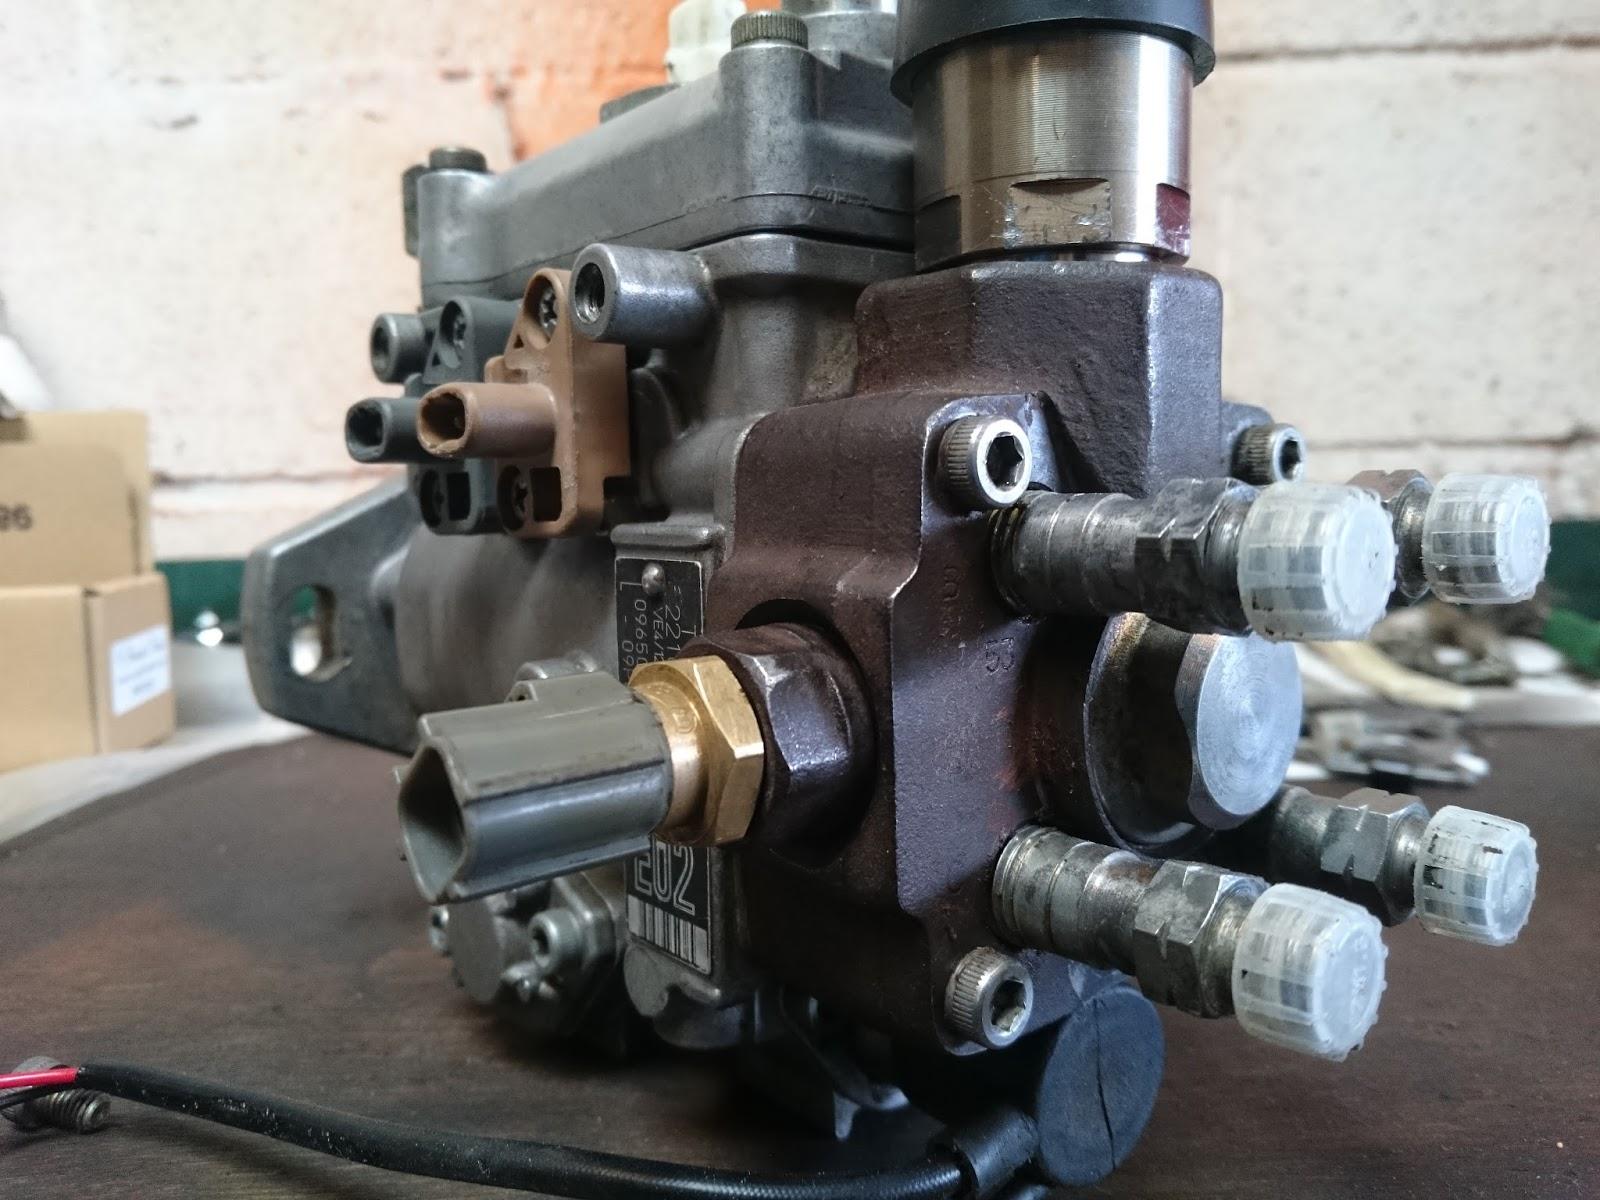 The Sunday Driver: Lucy: 1KZTE Fuel Pump Rebuild